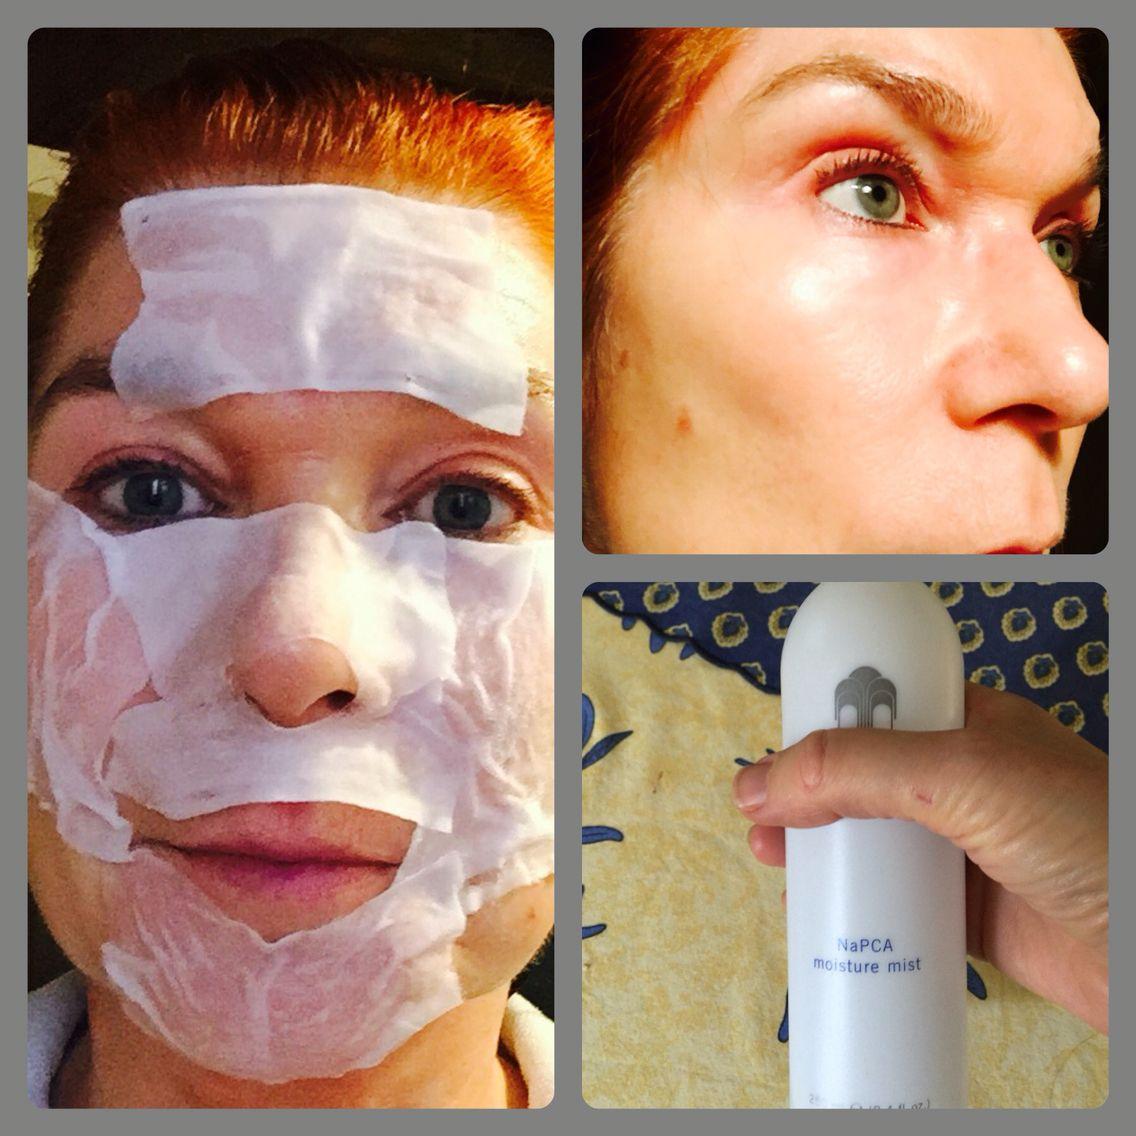 Lotion Mask Like Japanese Girls Do With Napca Moisture Mist Love It Moist